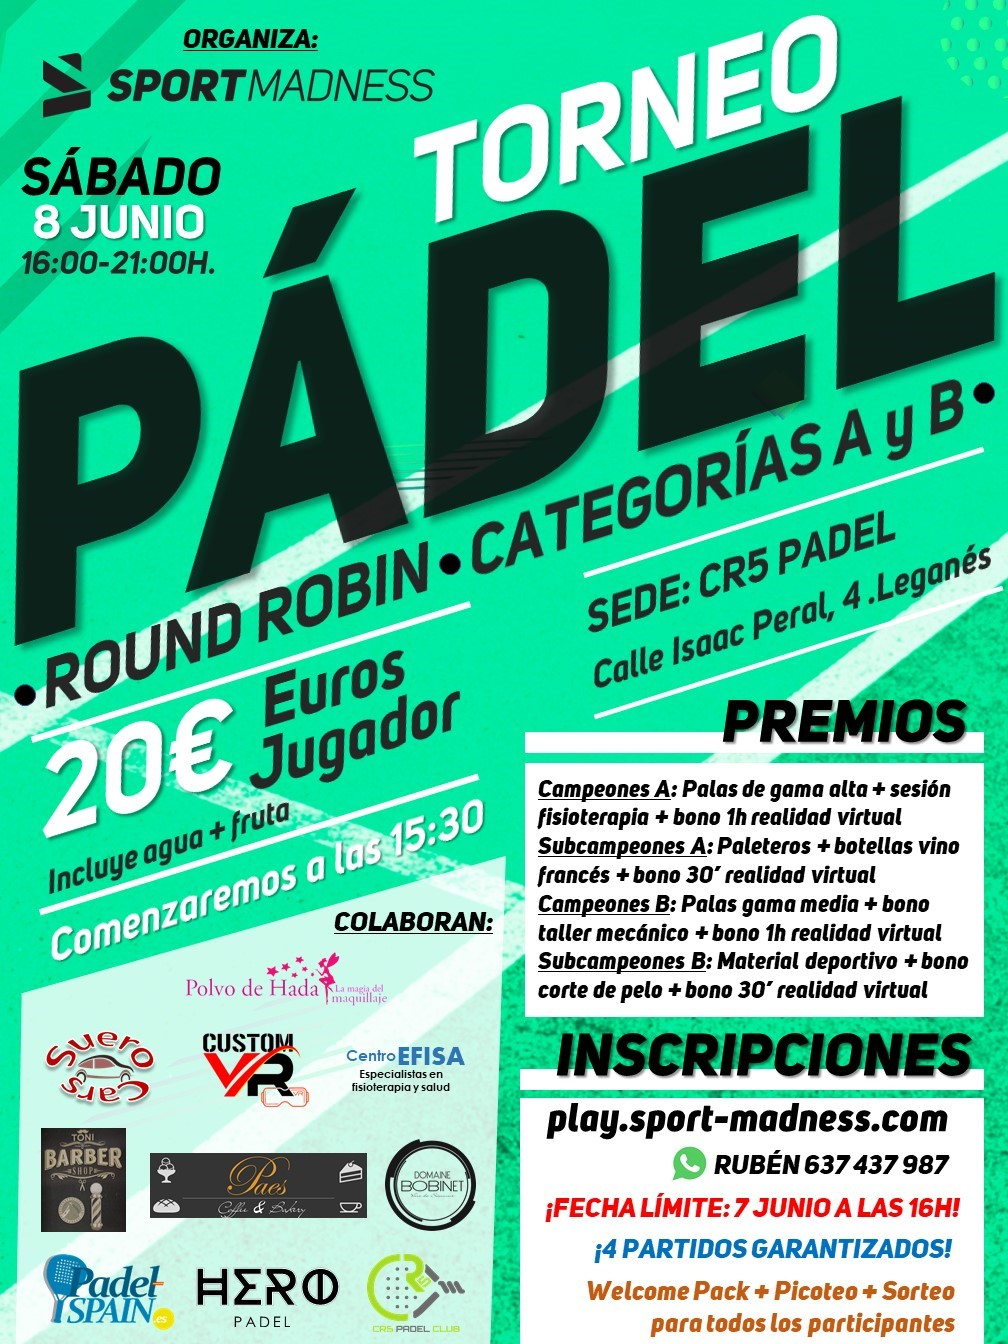 Torneo Express Sportmadness en CR5 Pádel este 8 de junio